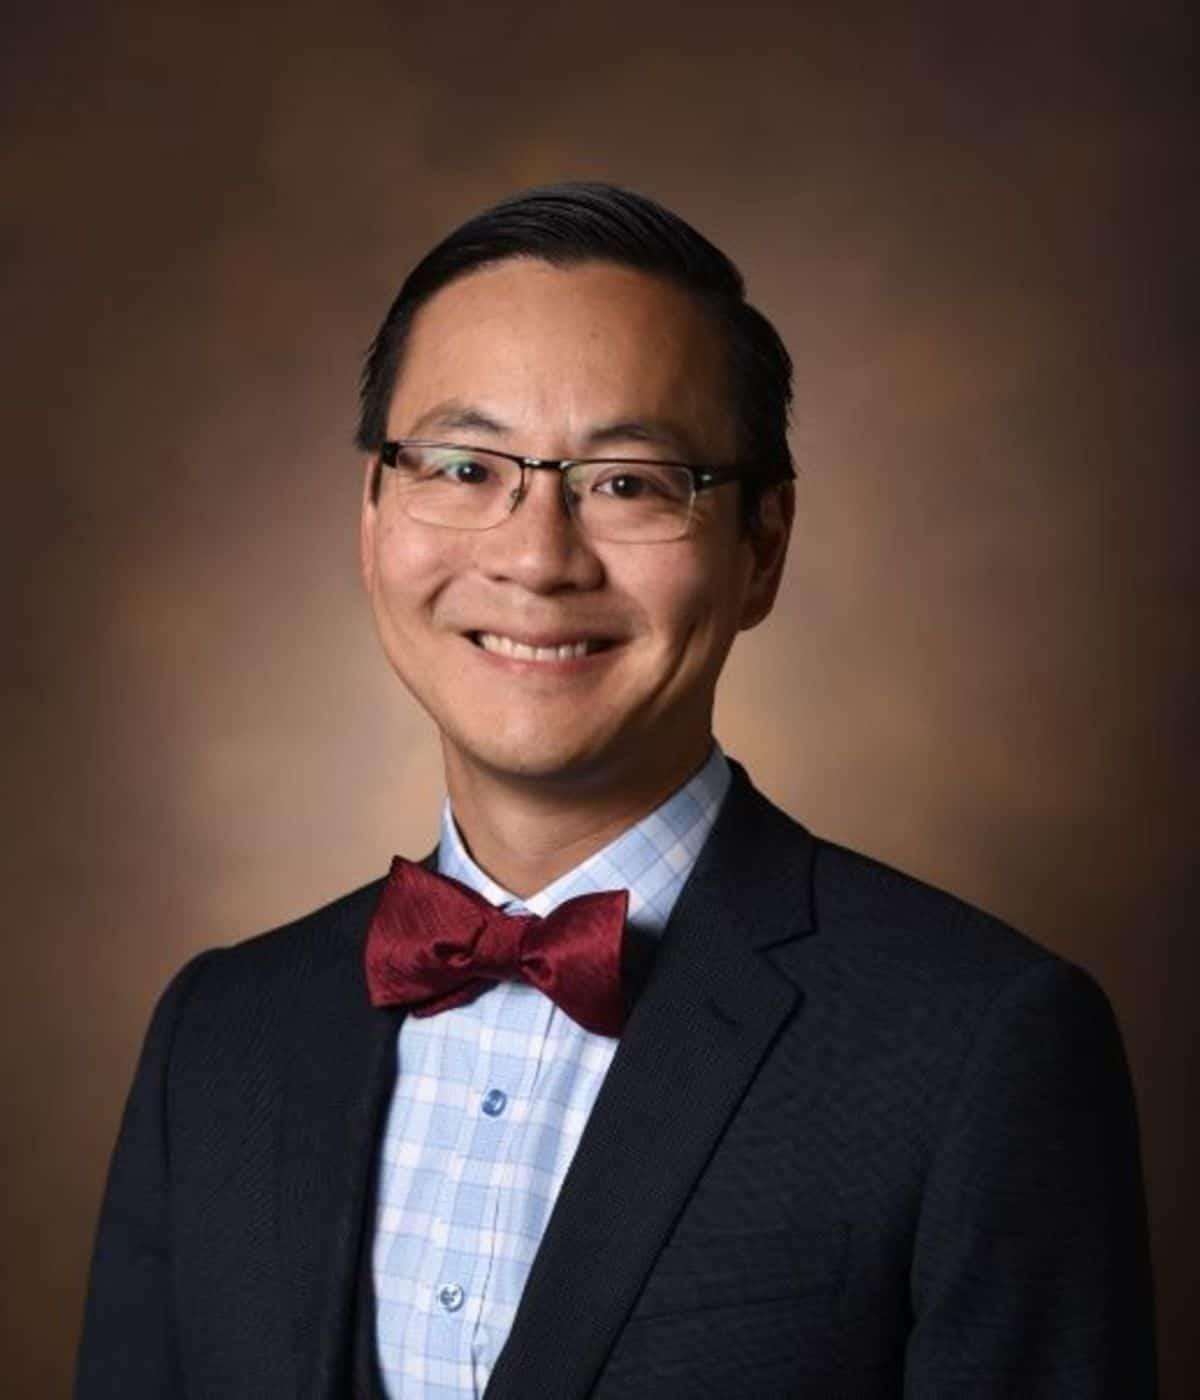 Michael S. Chin, MD, MPH